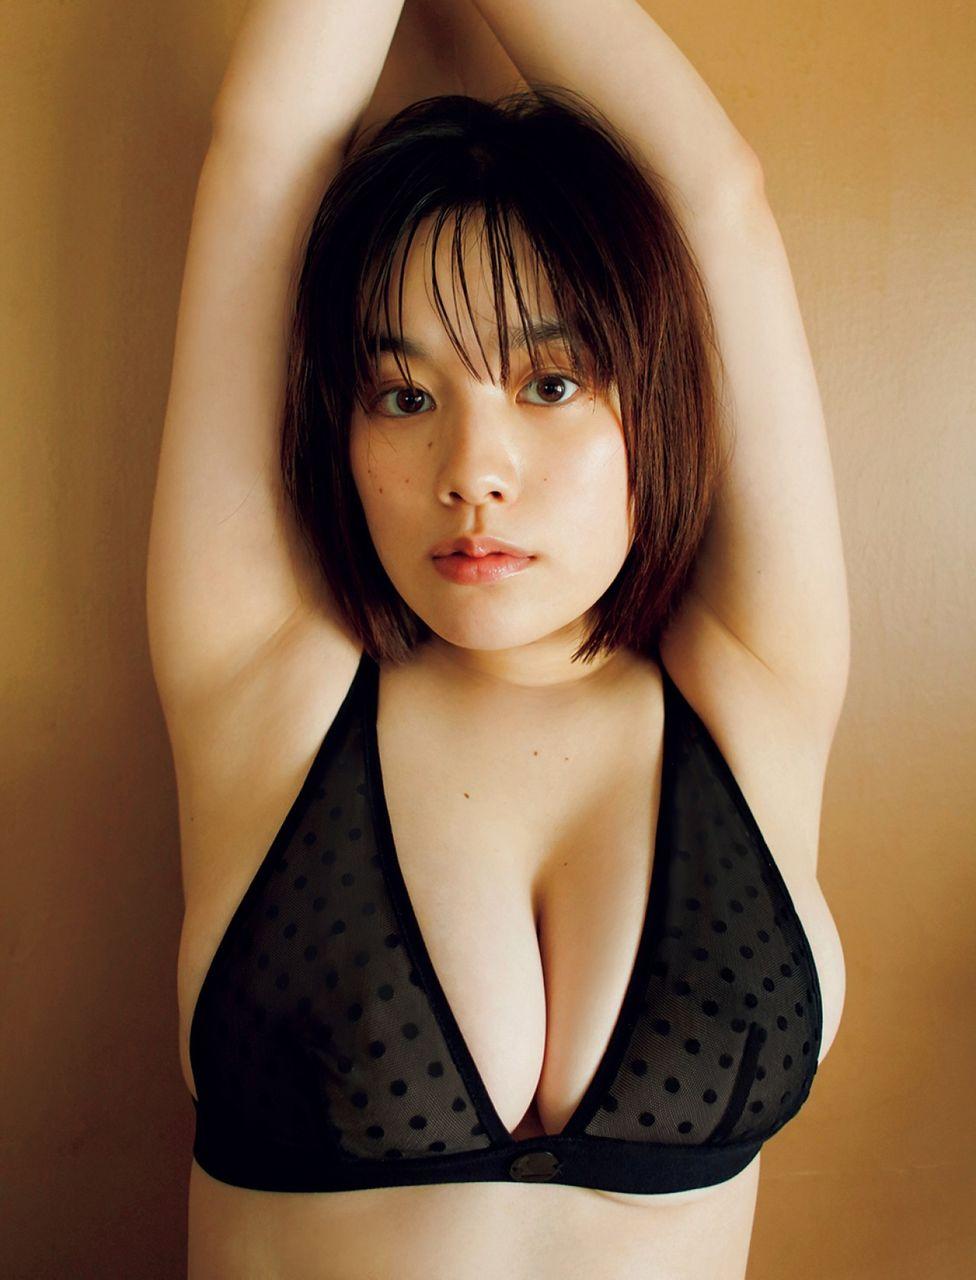 kakei_miwako271.jpg